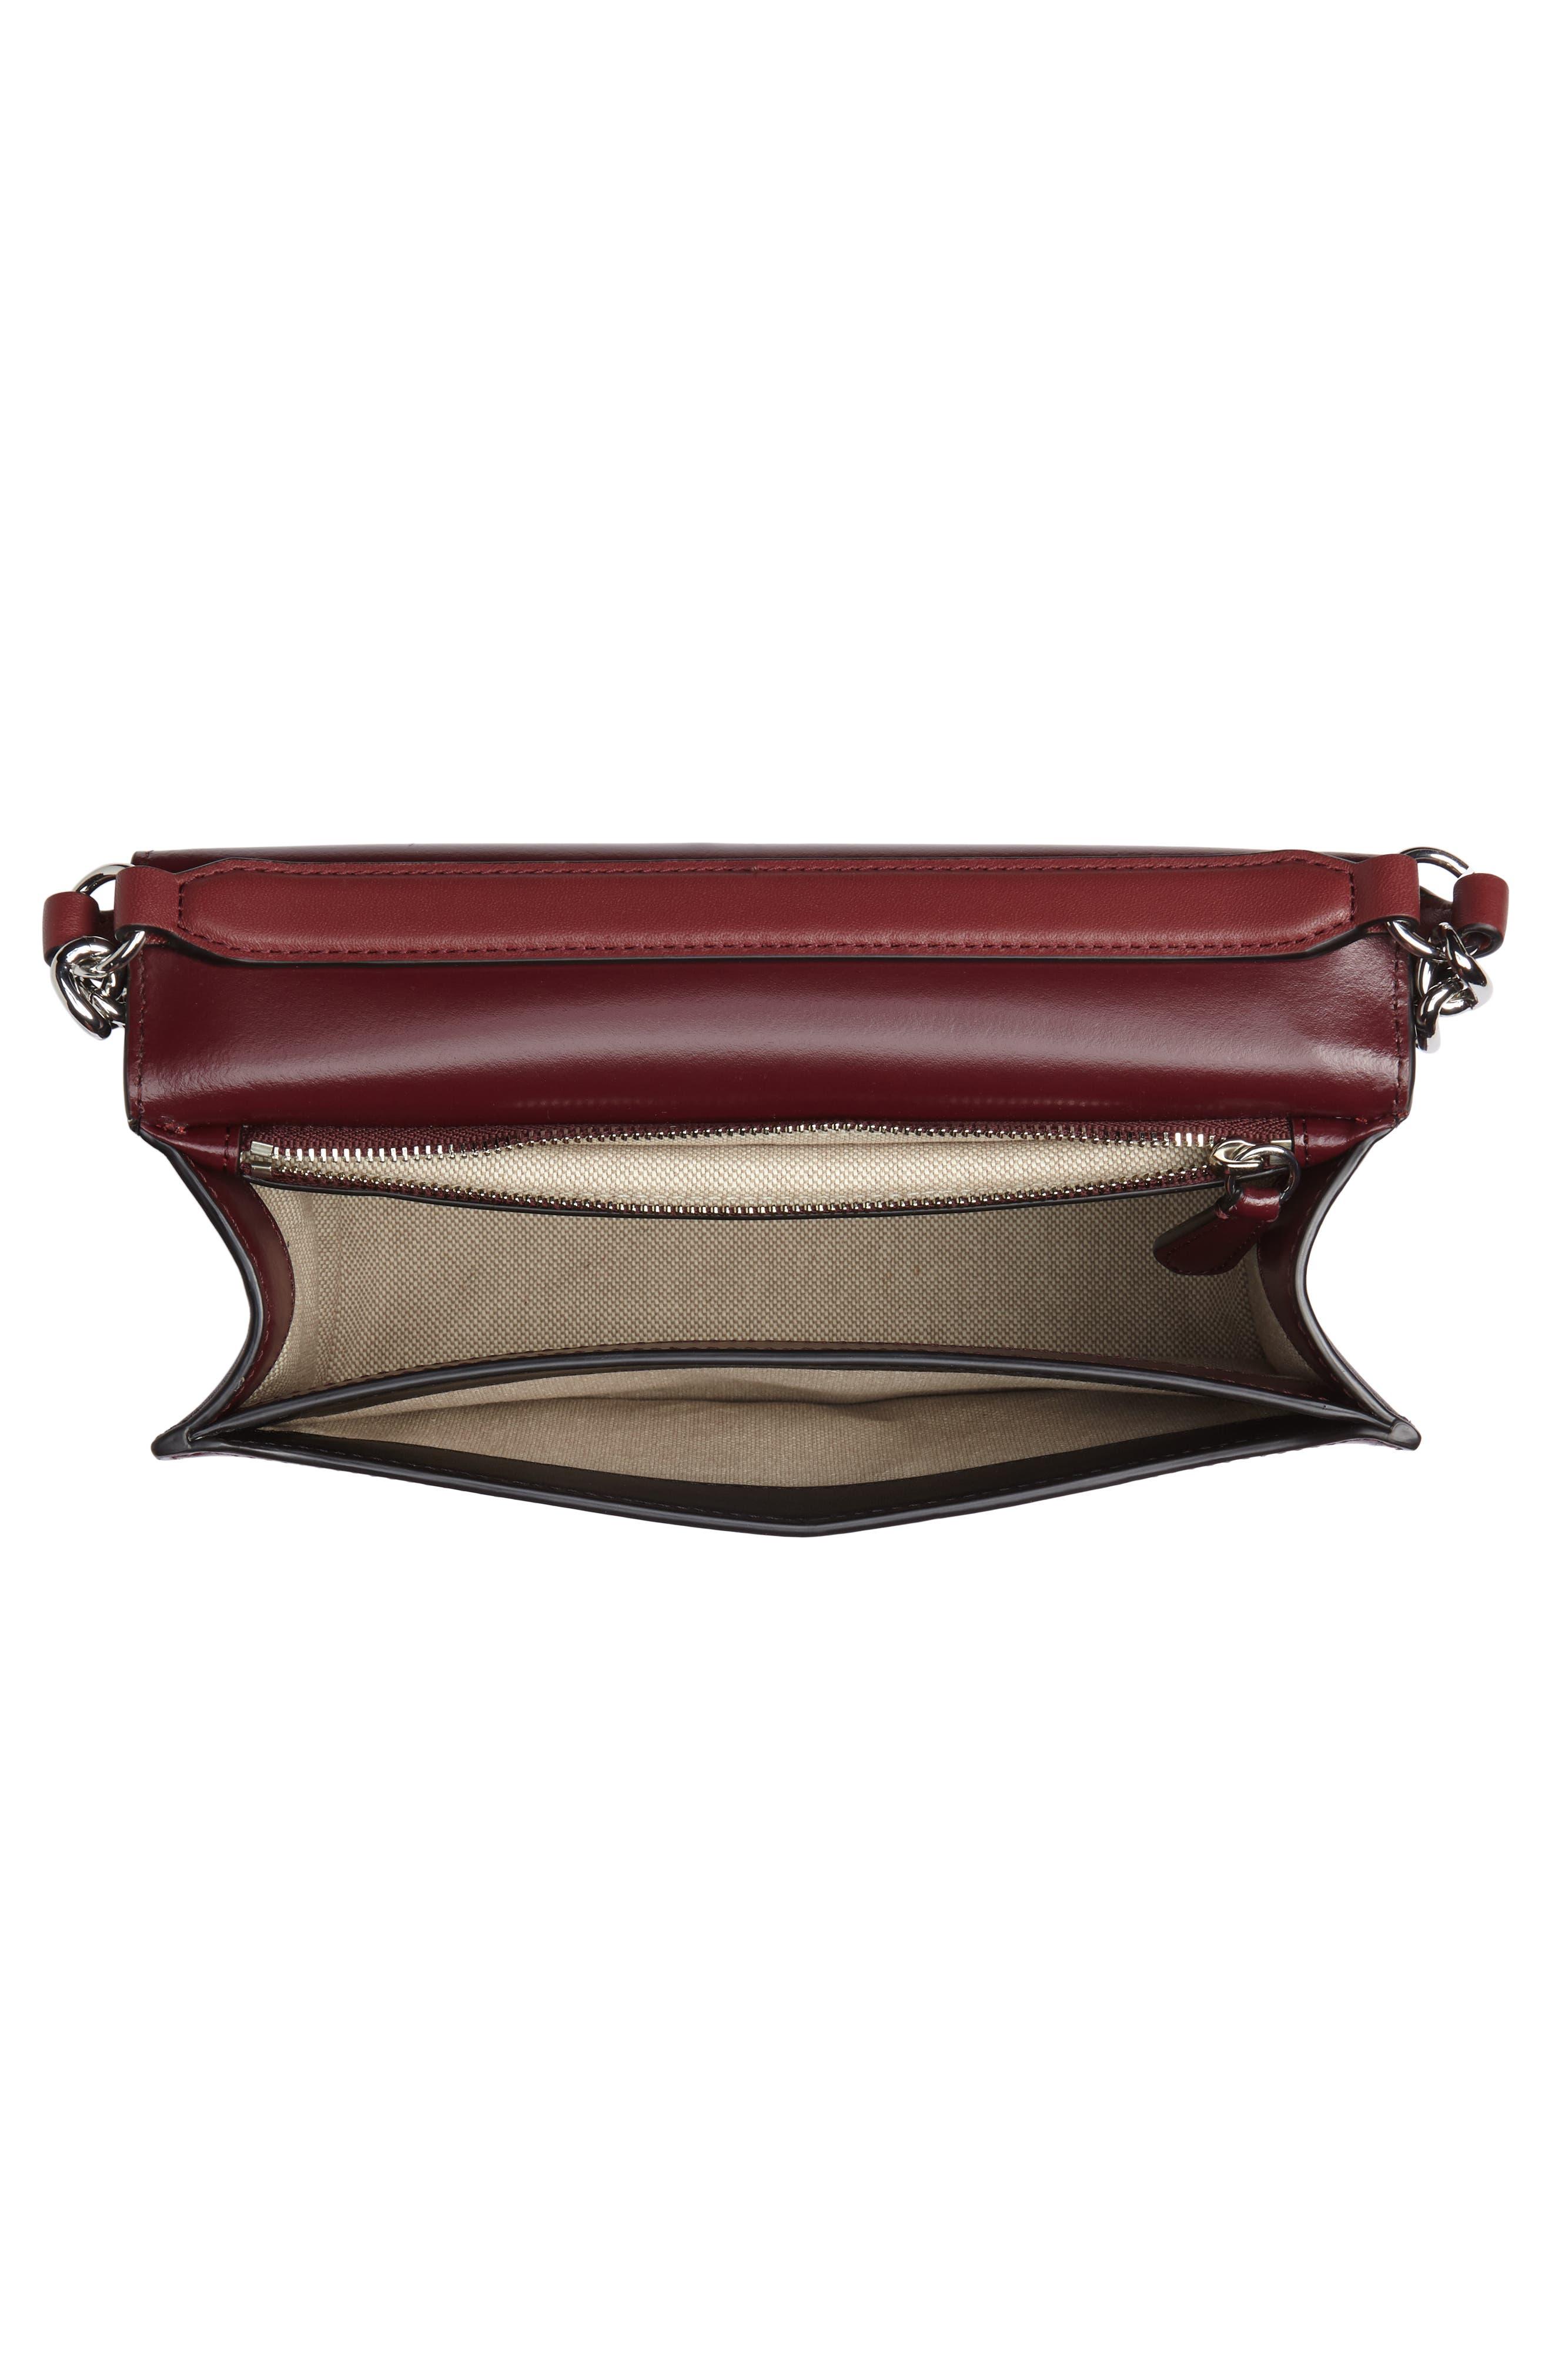 Bonne Soirée Leather & Genuine Snakeskin Top Handle Bag,                             Alternate thumbnail 4, color,